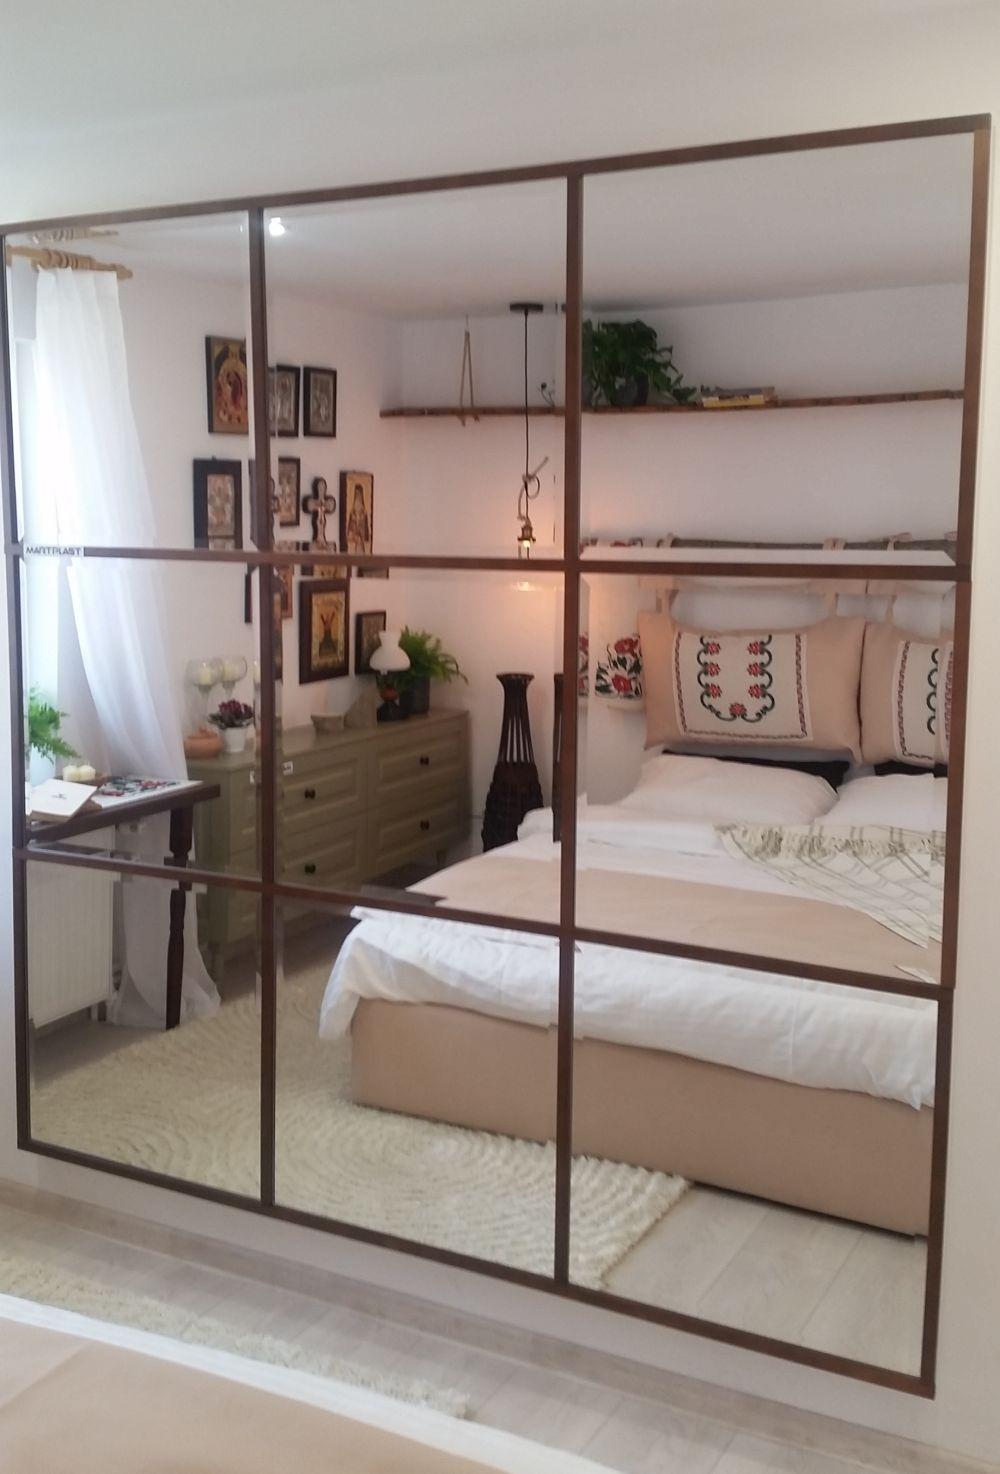 adelaparvu.com despre renovarea casei familiei Serbana din Nedelea, episodul 1, sezonul 4, Visuri la cheie, Foto Adela Parvu (10)